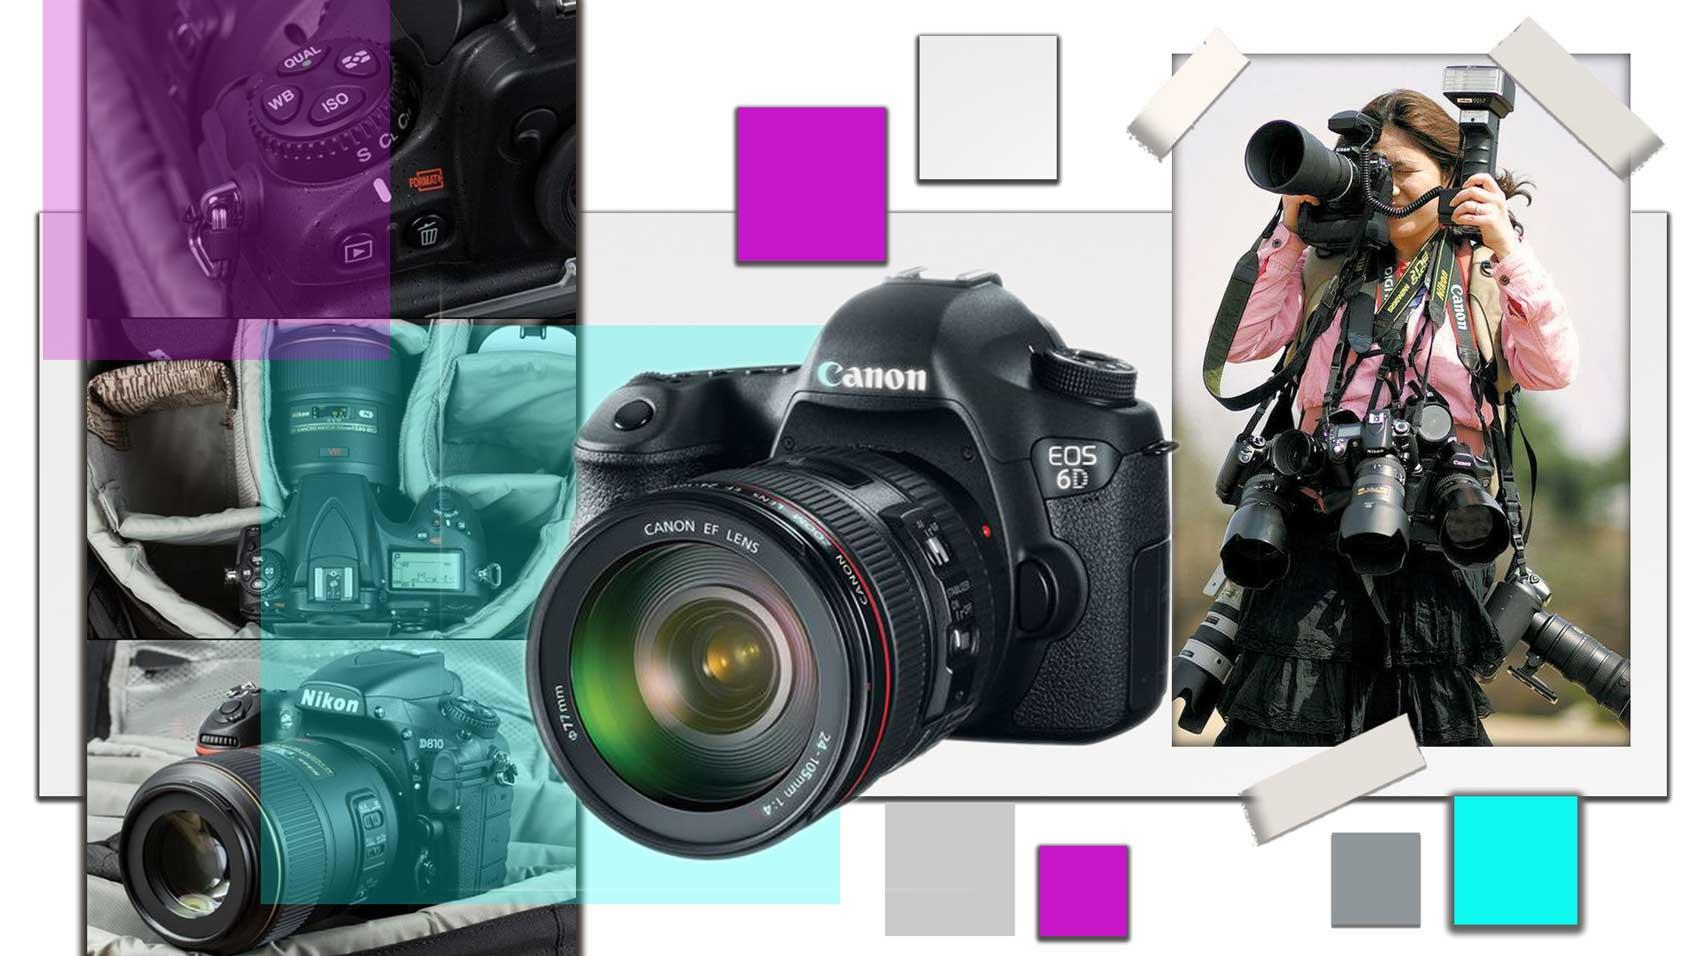 professiona1 photographe 10a - چگونه میتوان حرفه عکاسی را برای همیشه داشت ؟